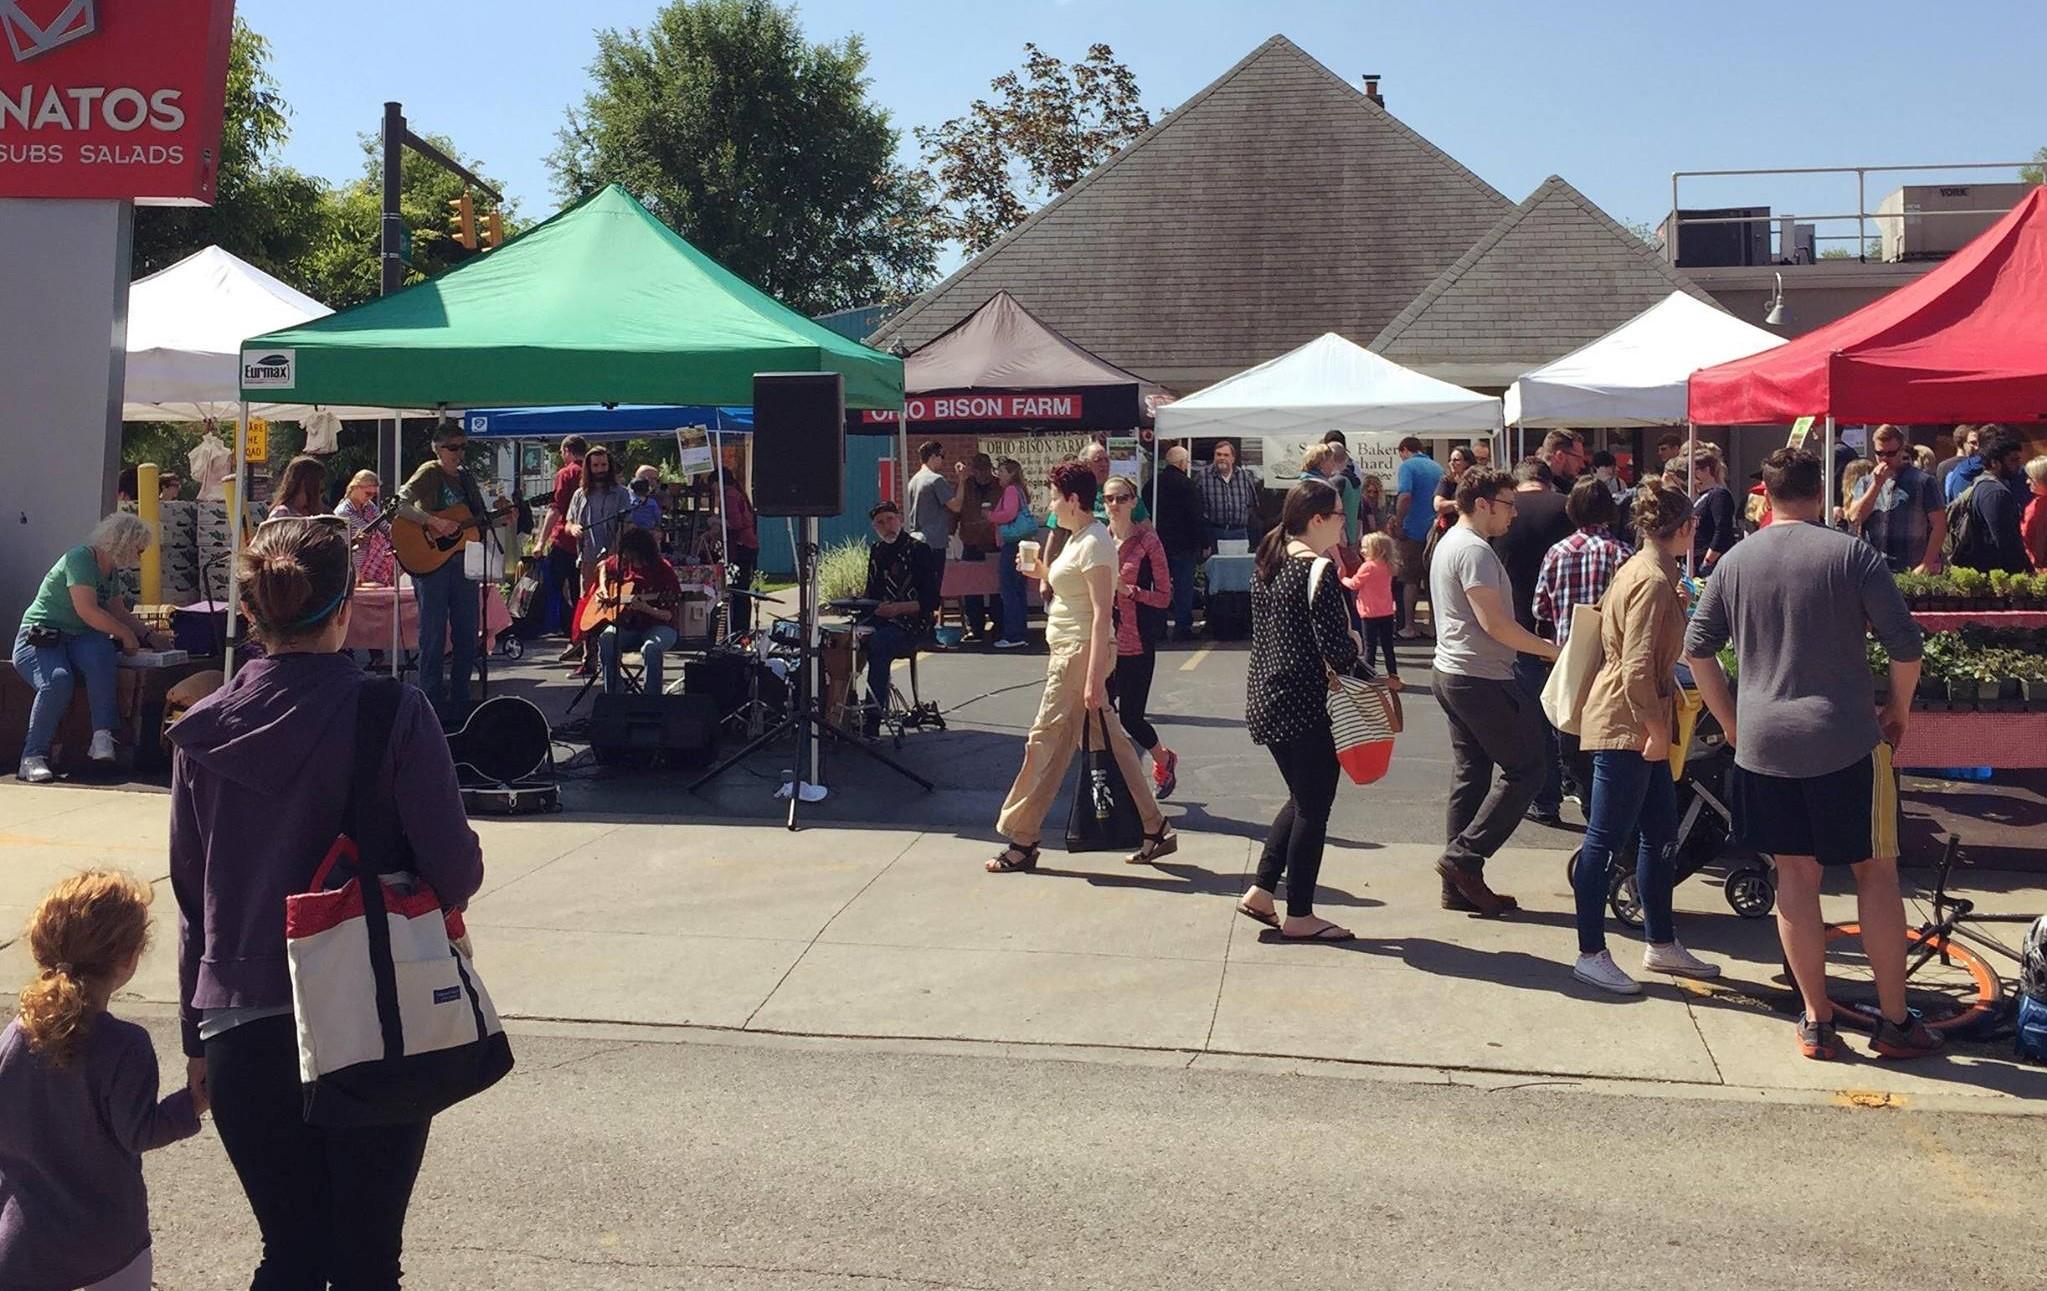 Clintonville Farmers' Market tent & people